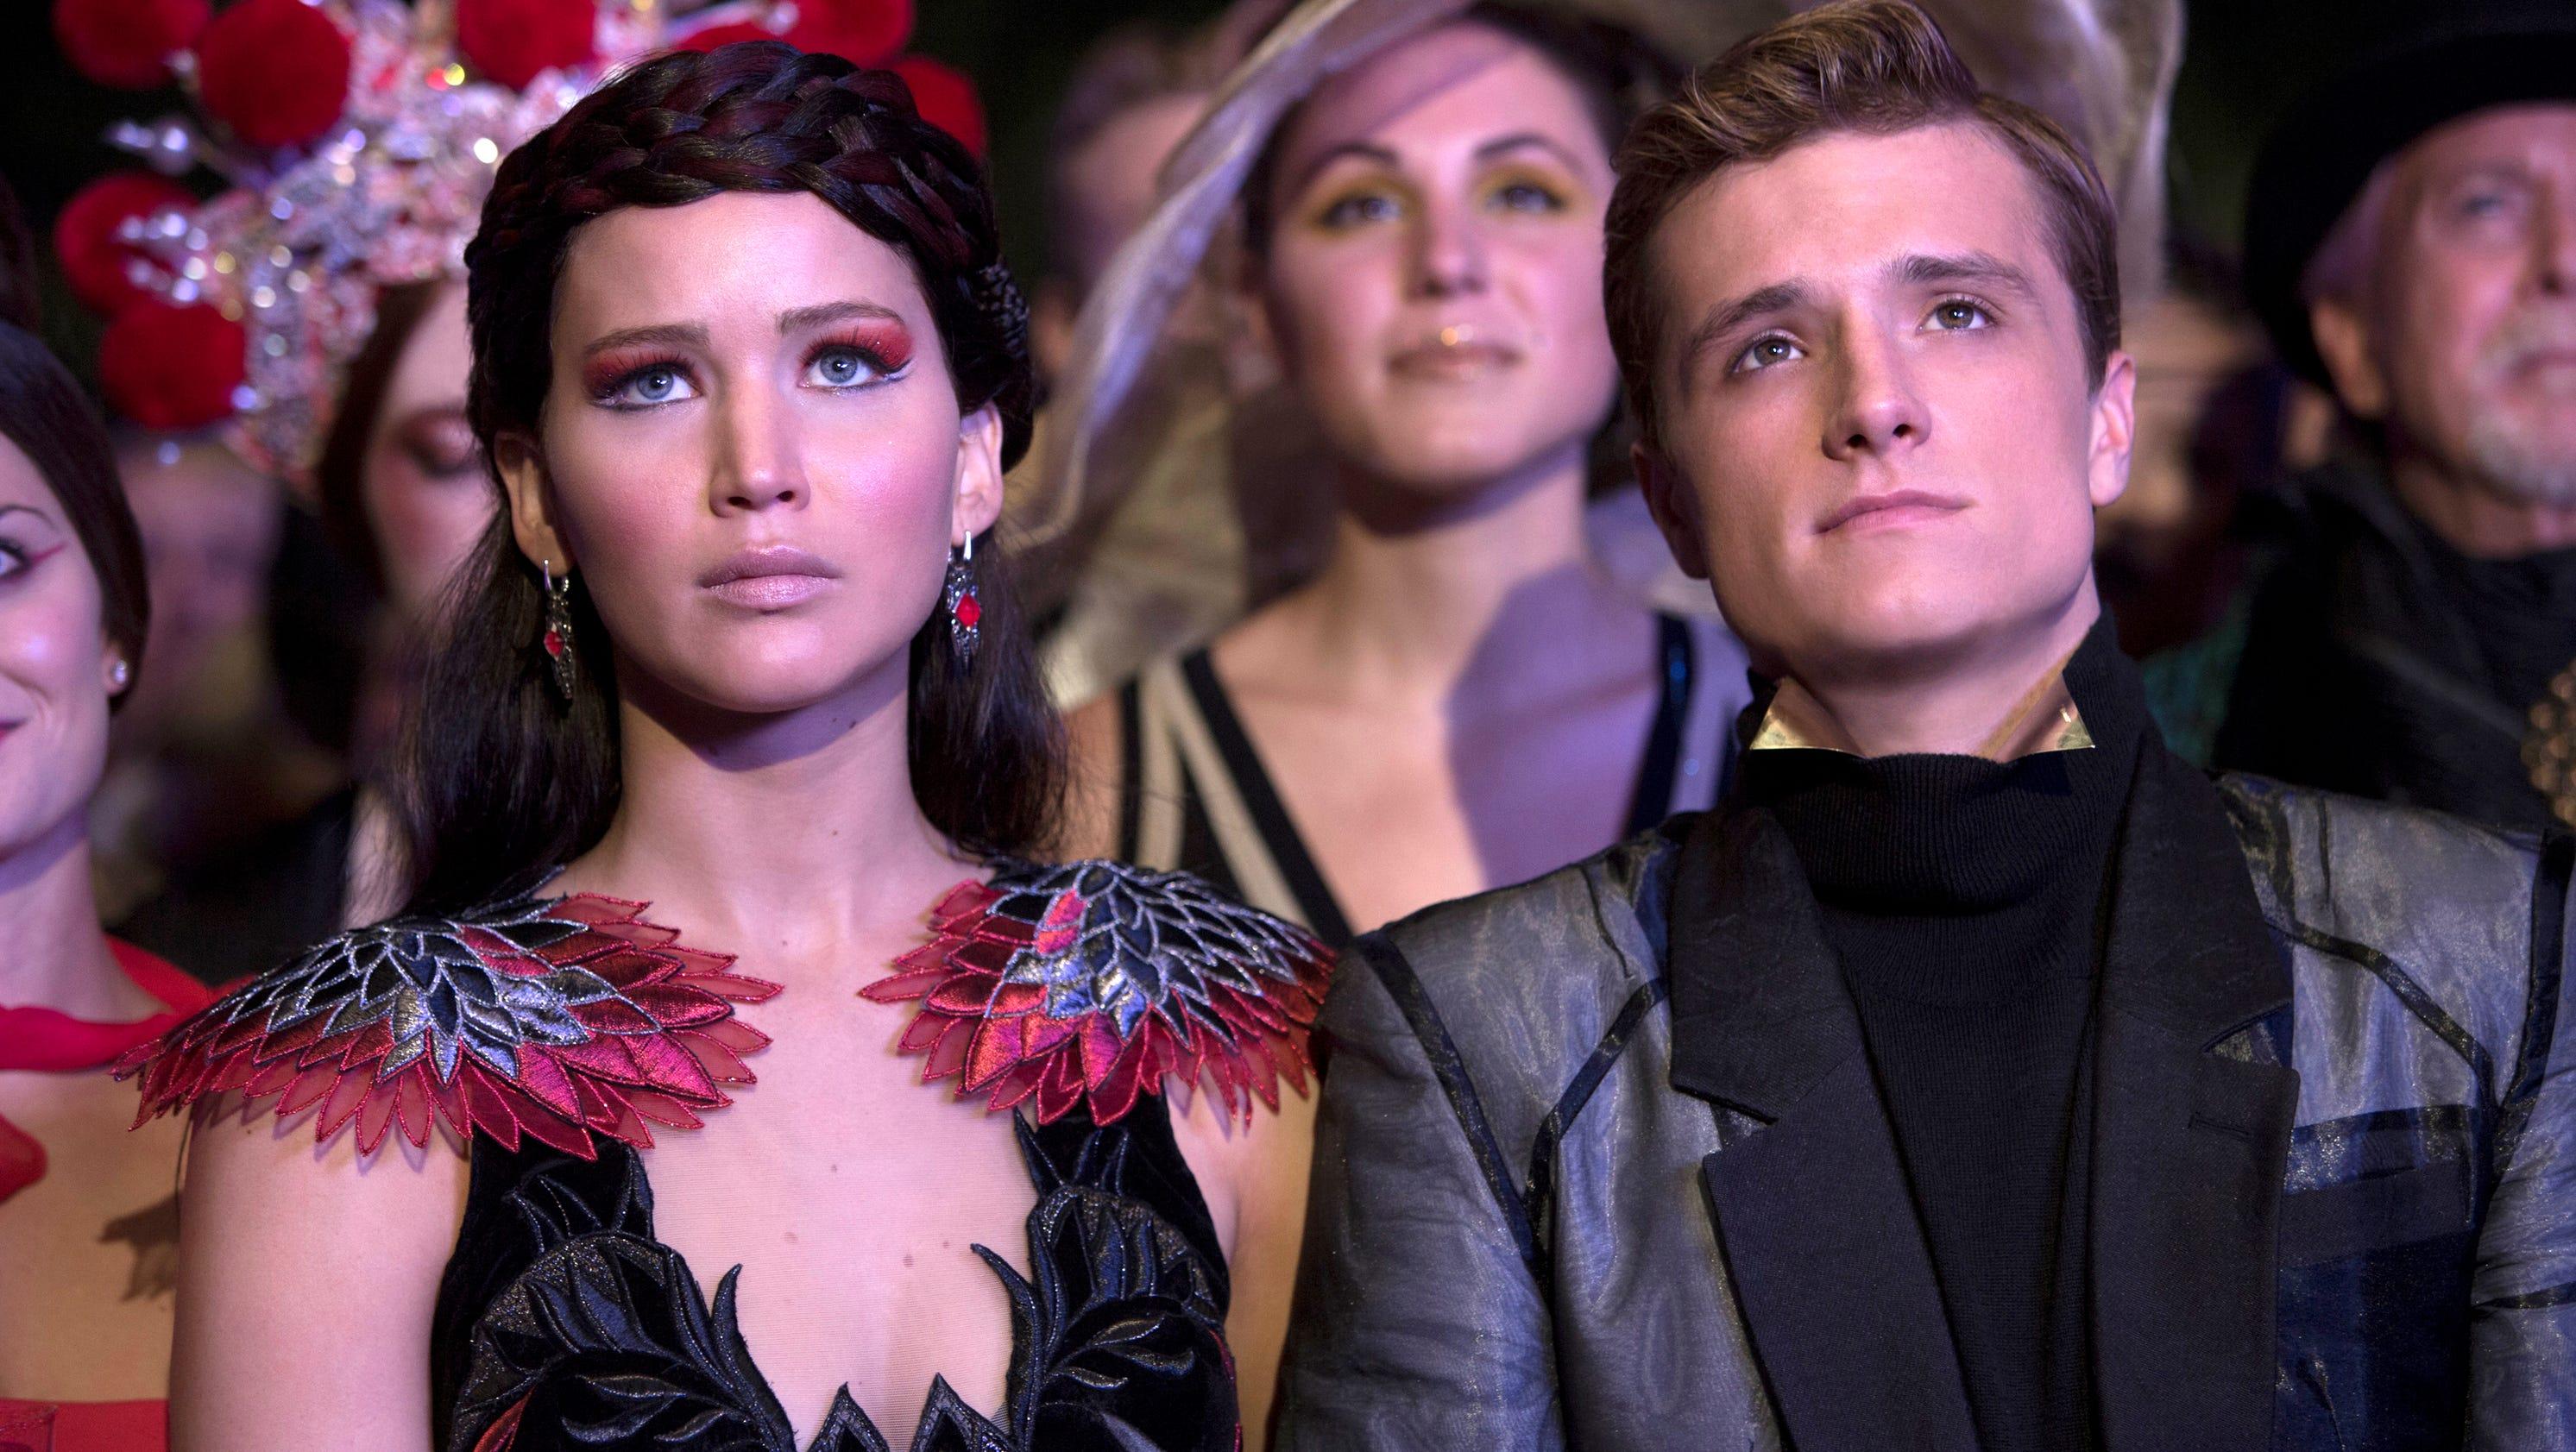 Surprised Patrick Hunger Games